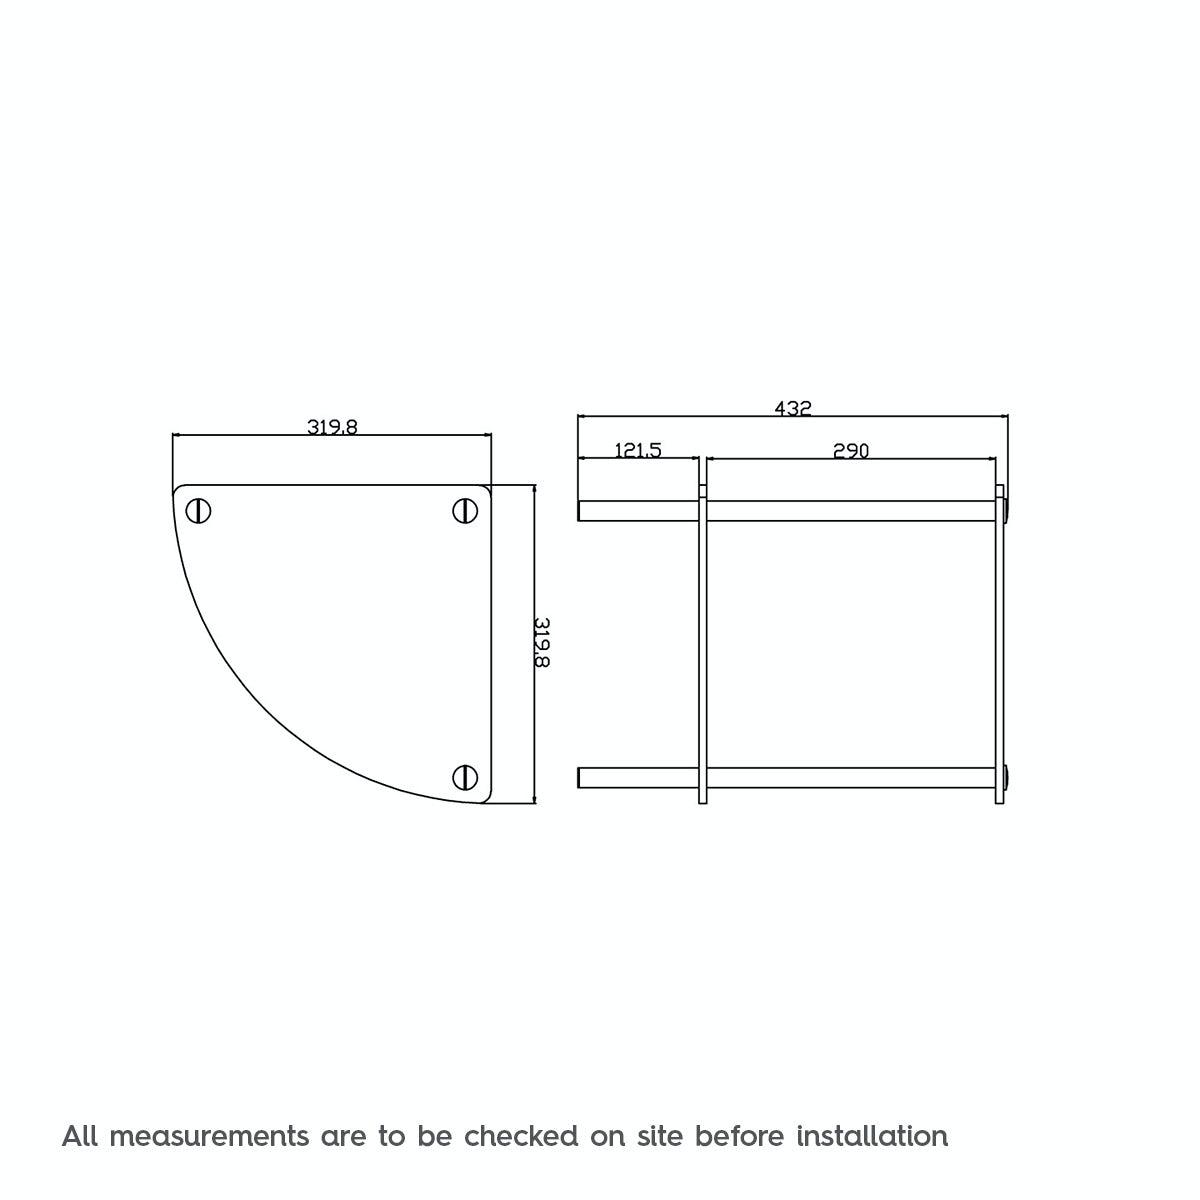 Dimensions for Orchard Options freestanding quadrant 2 glass shelf unit